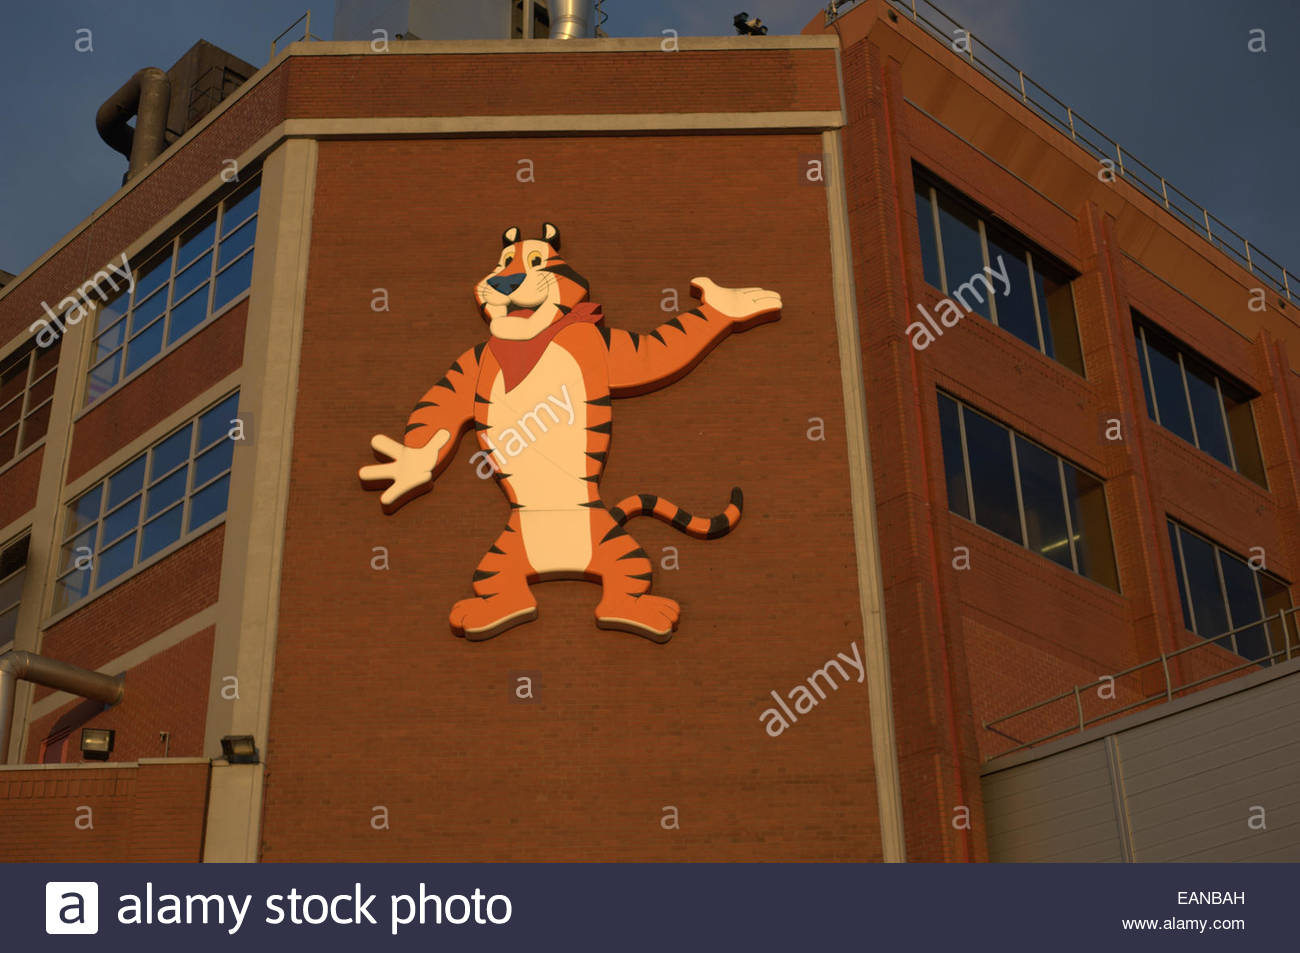 the sun shining on the tony the tiger cartoon character the motif